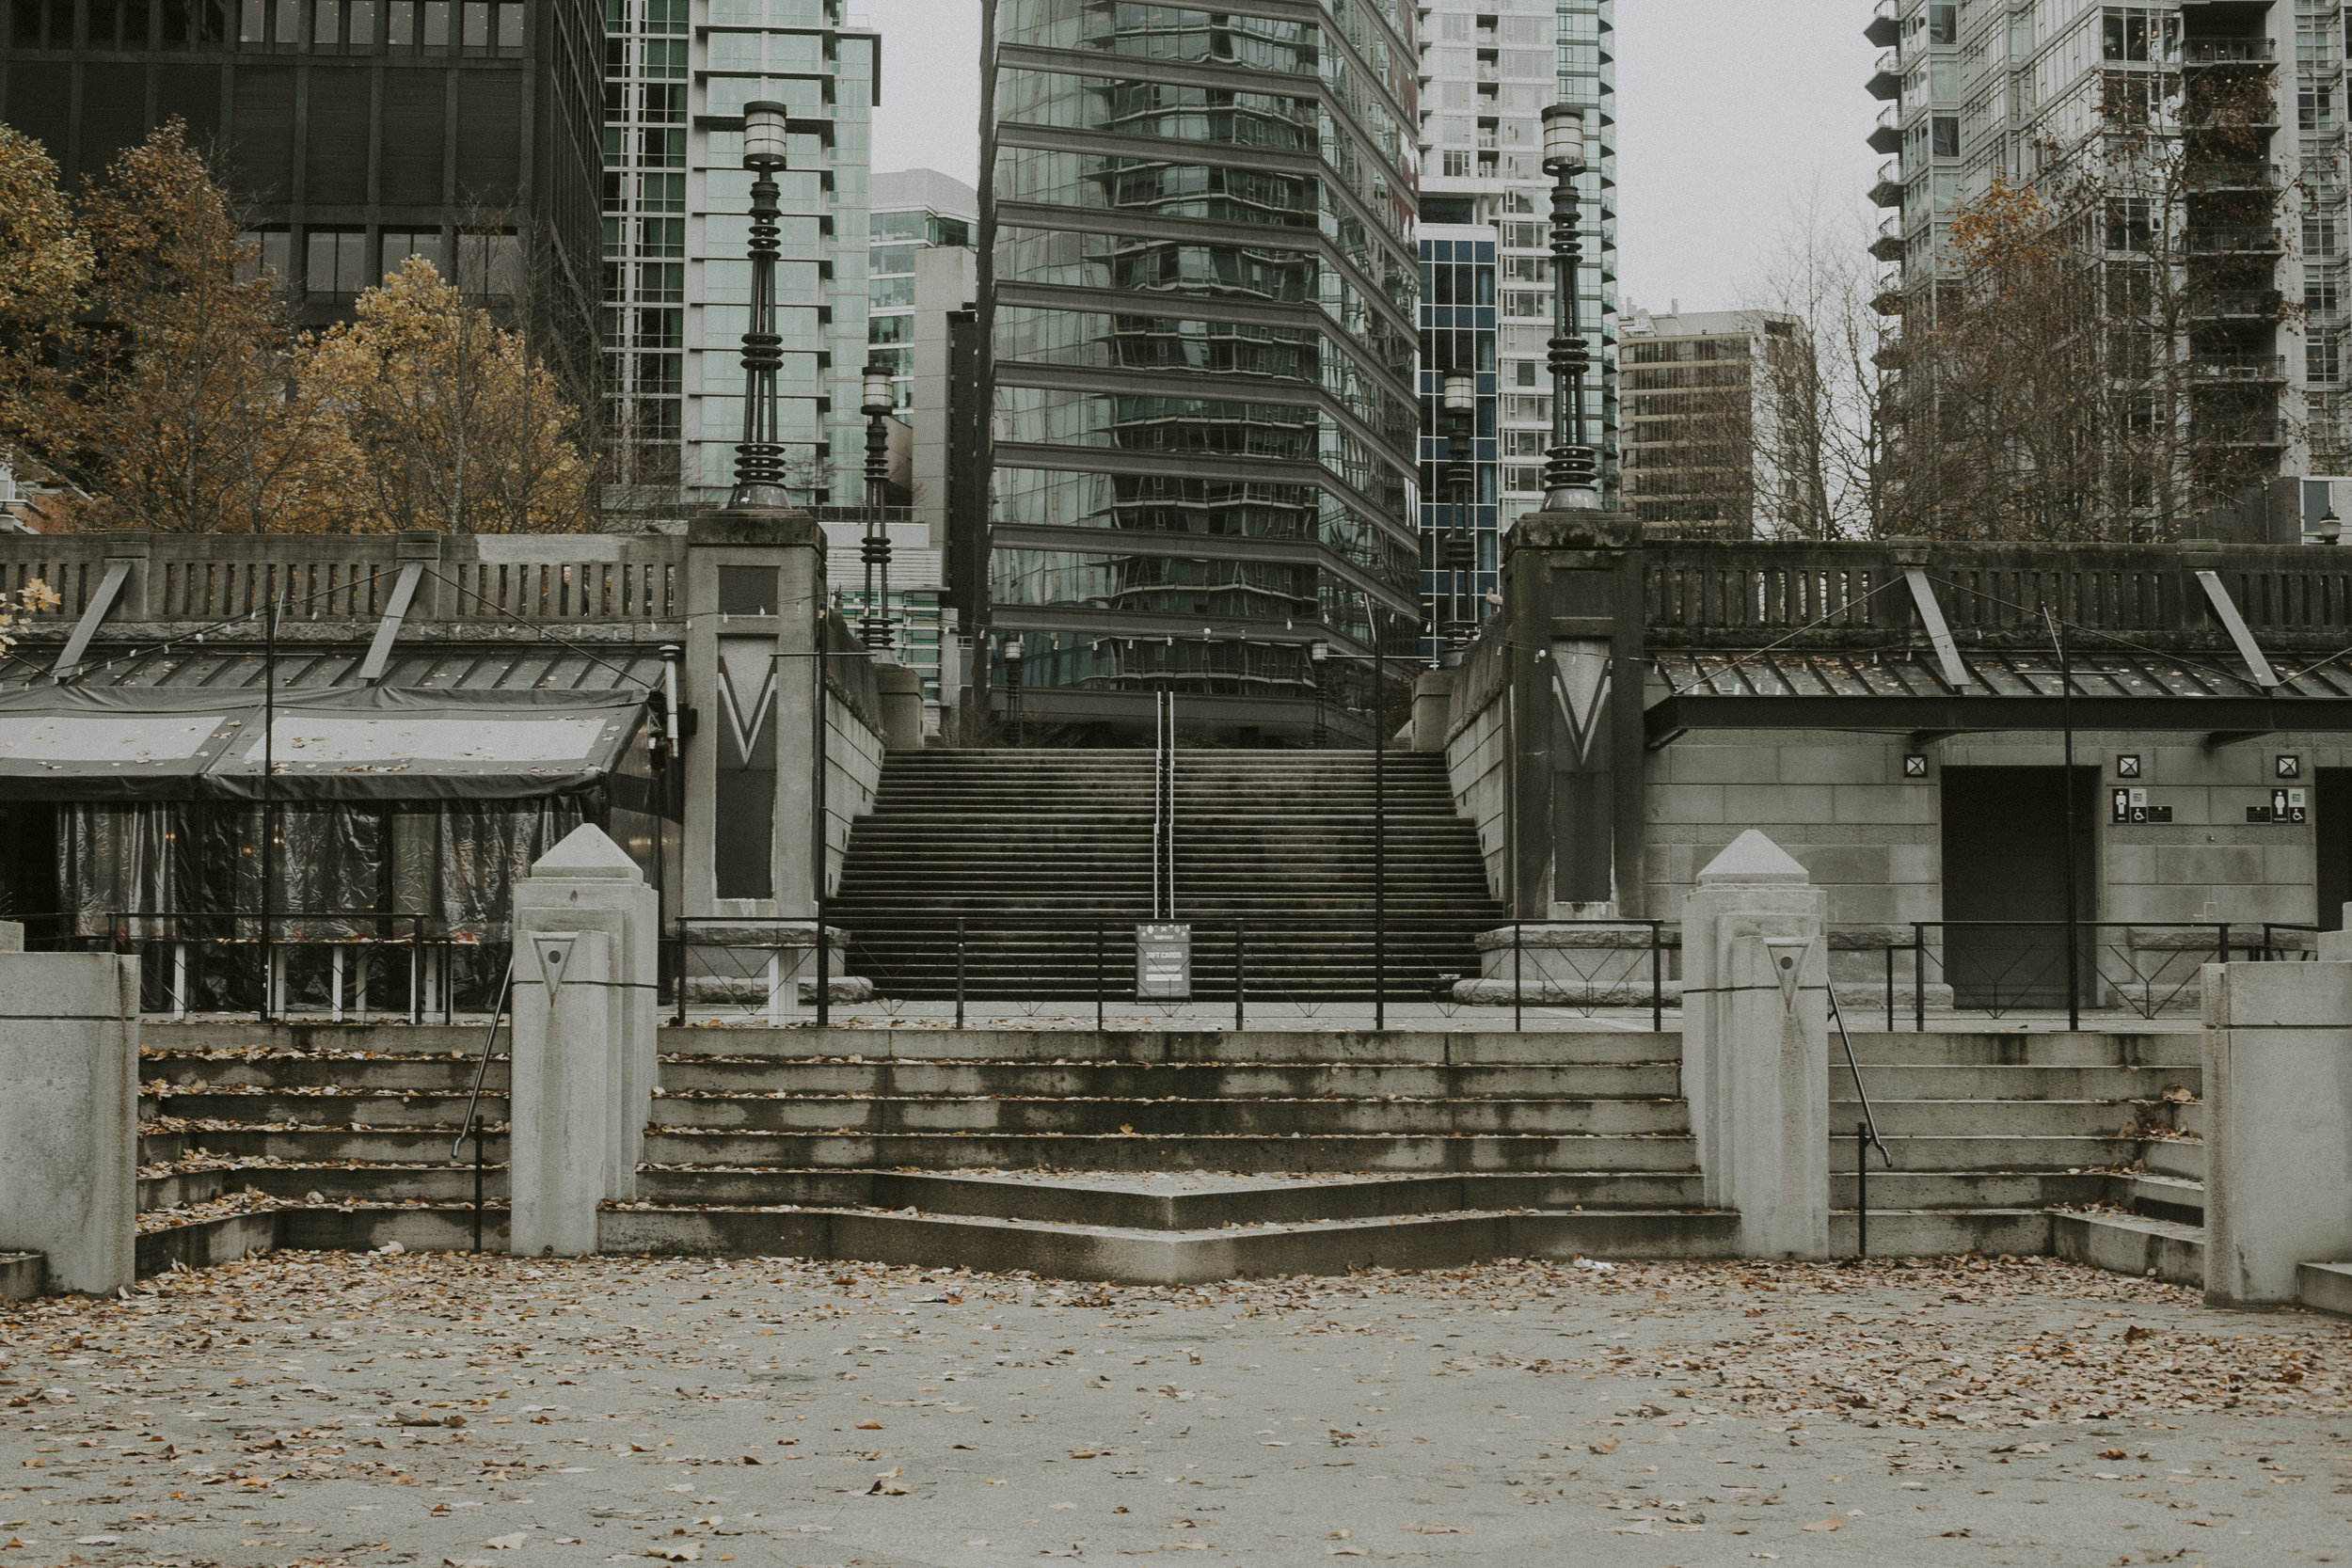 Harbor Green Park Public Washroom, Vancouver